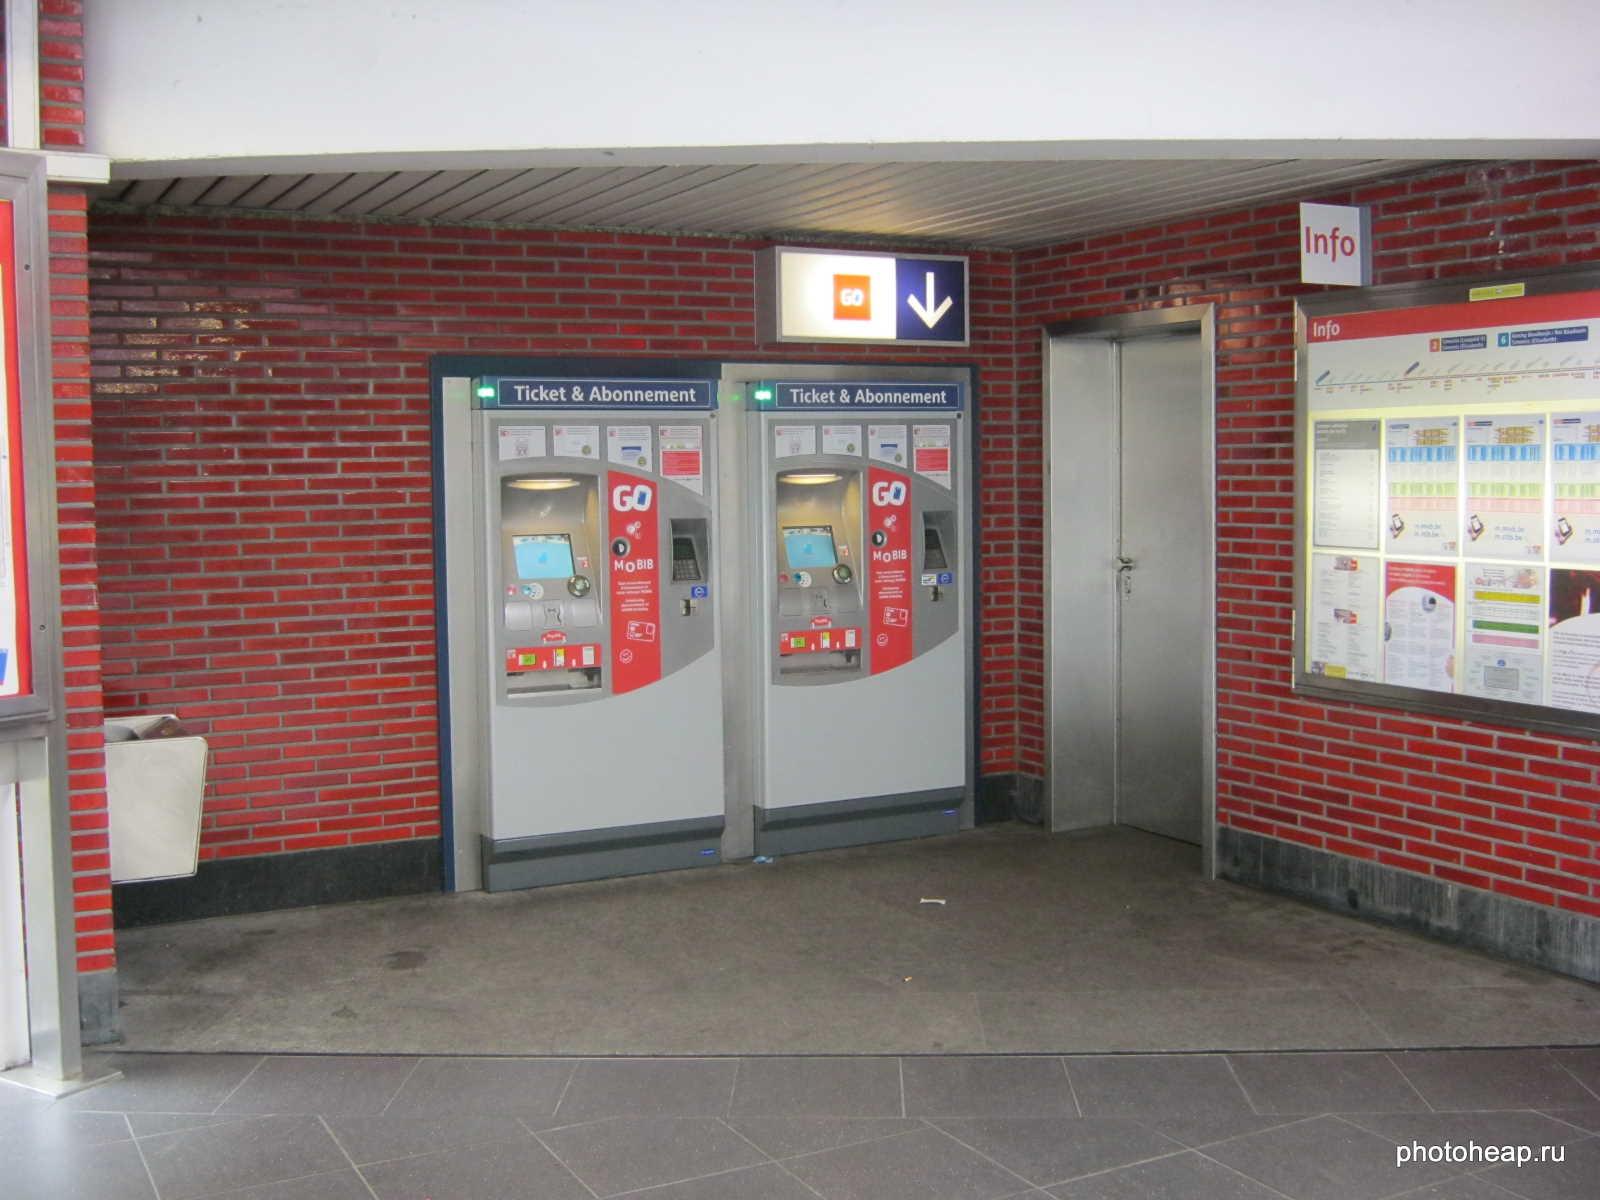 Brussels - Metro ticket machines